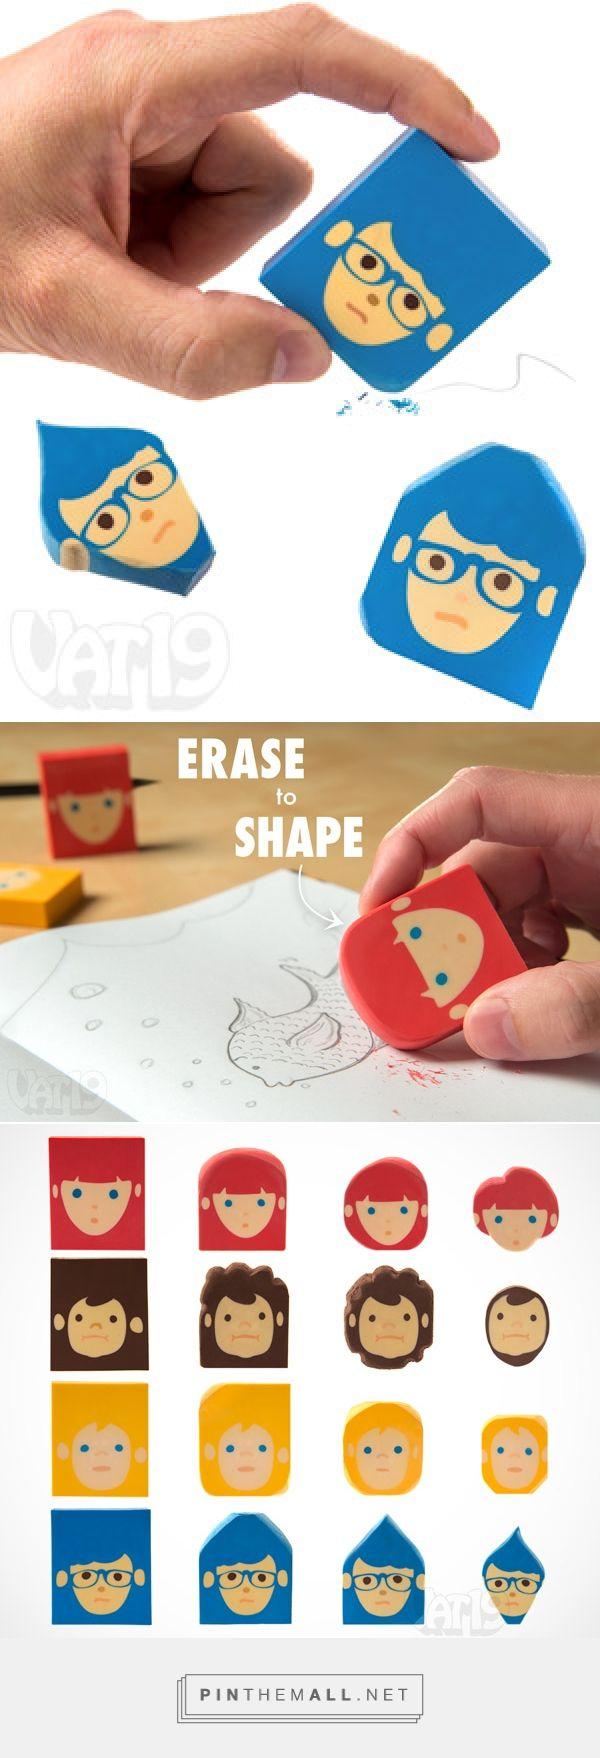 Barber Erasers: Craft a haircut as you erase